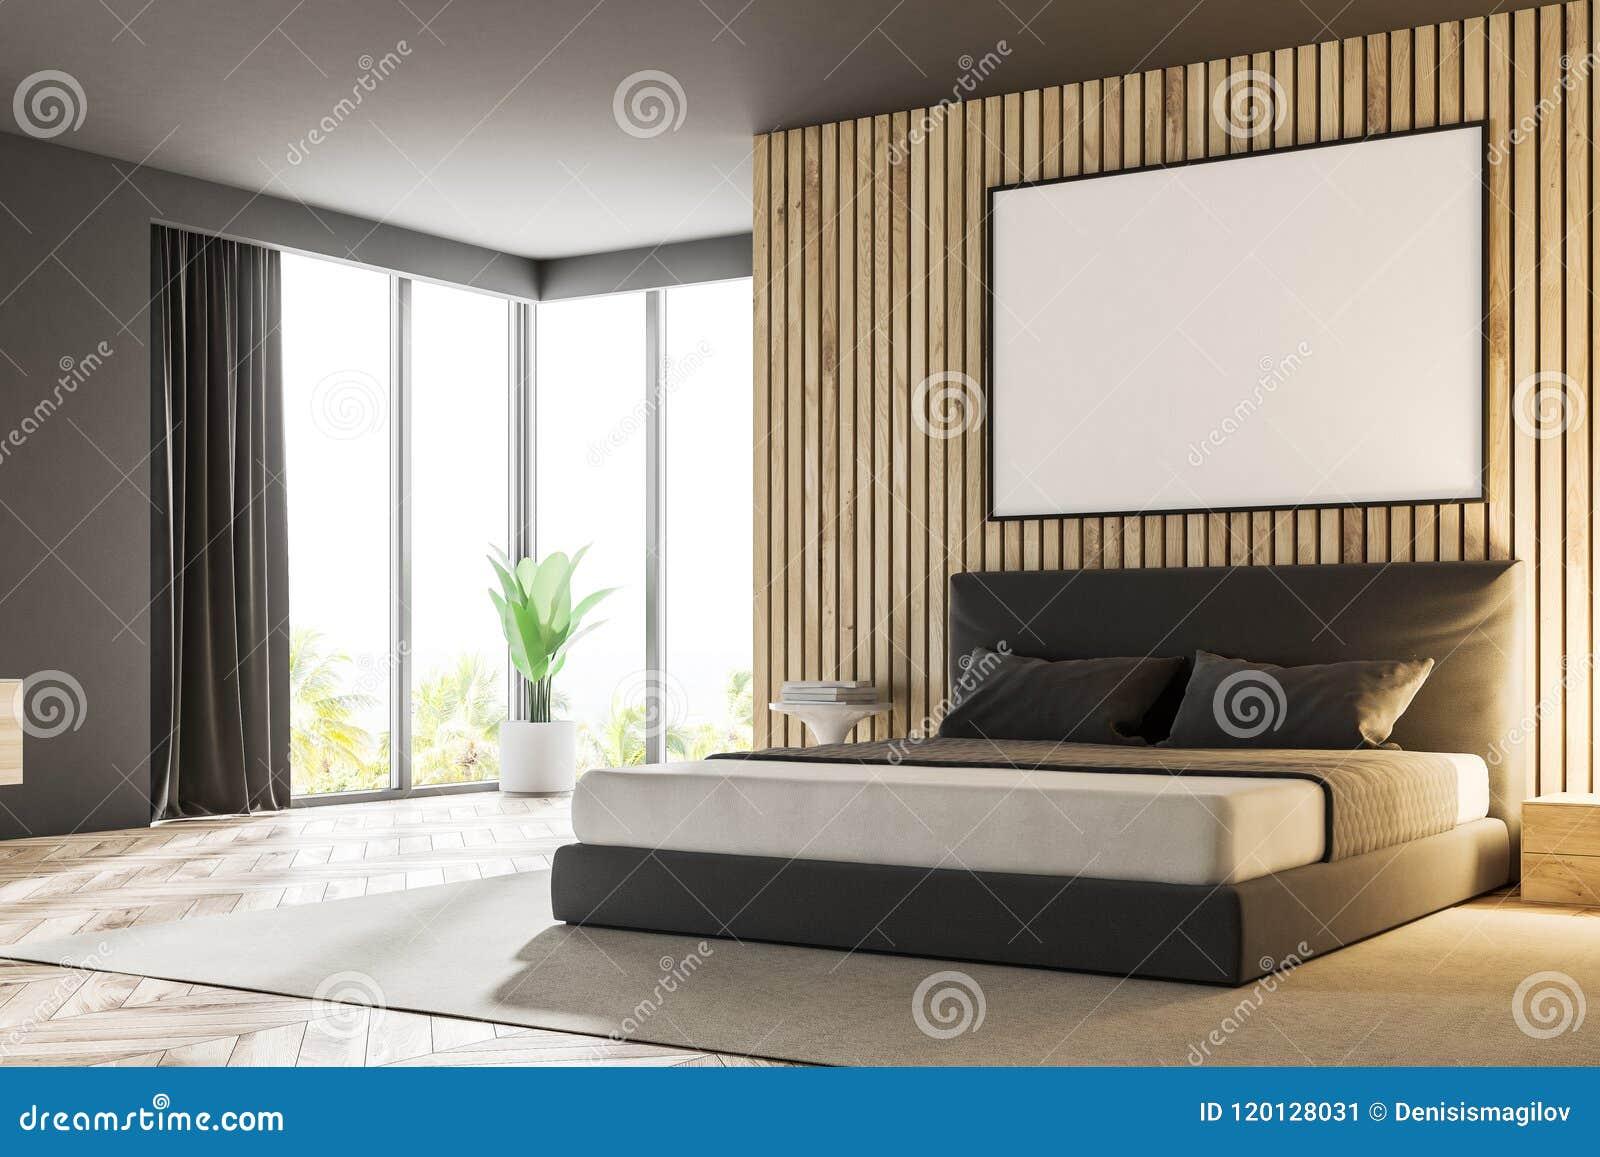 Wood Master Bedroom Corner, Poster Stock Illustration - Illustration ...